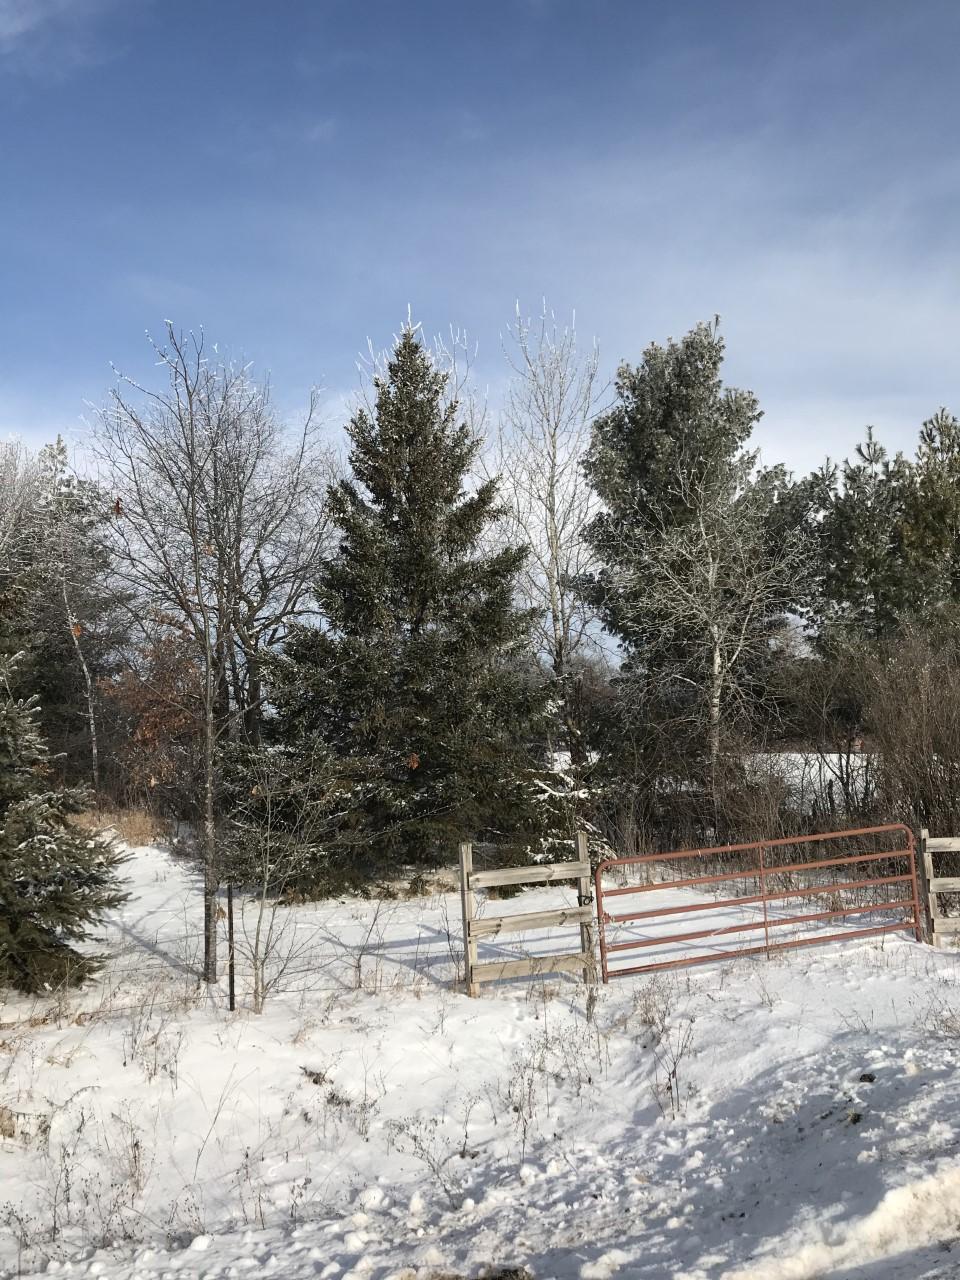 0 10 3/4 Property Photo - Prairie Lake Twp, WI real estate listing